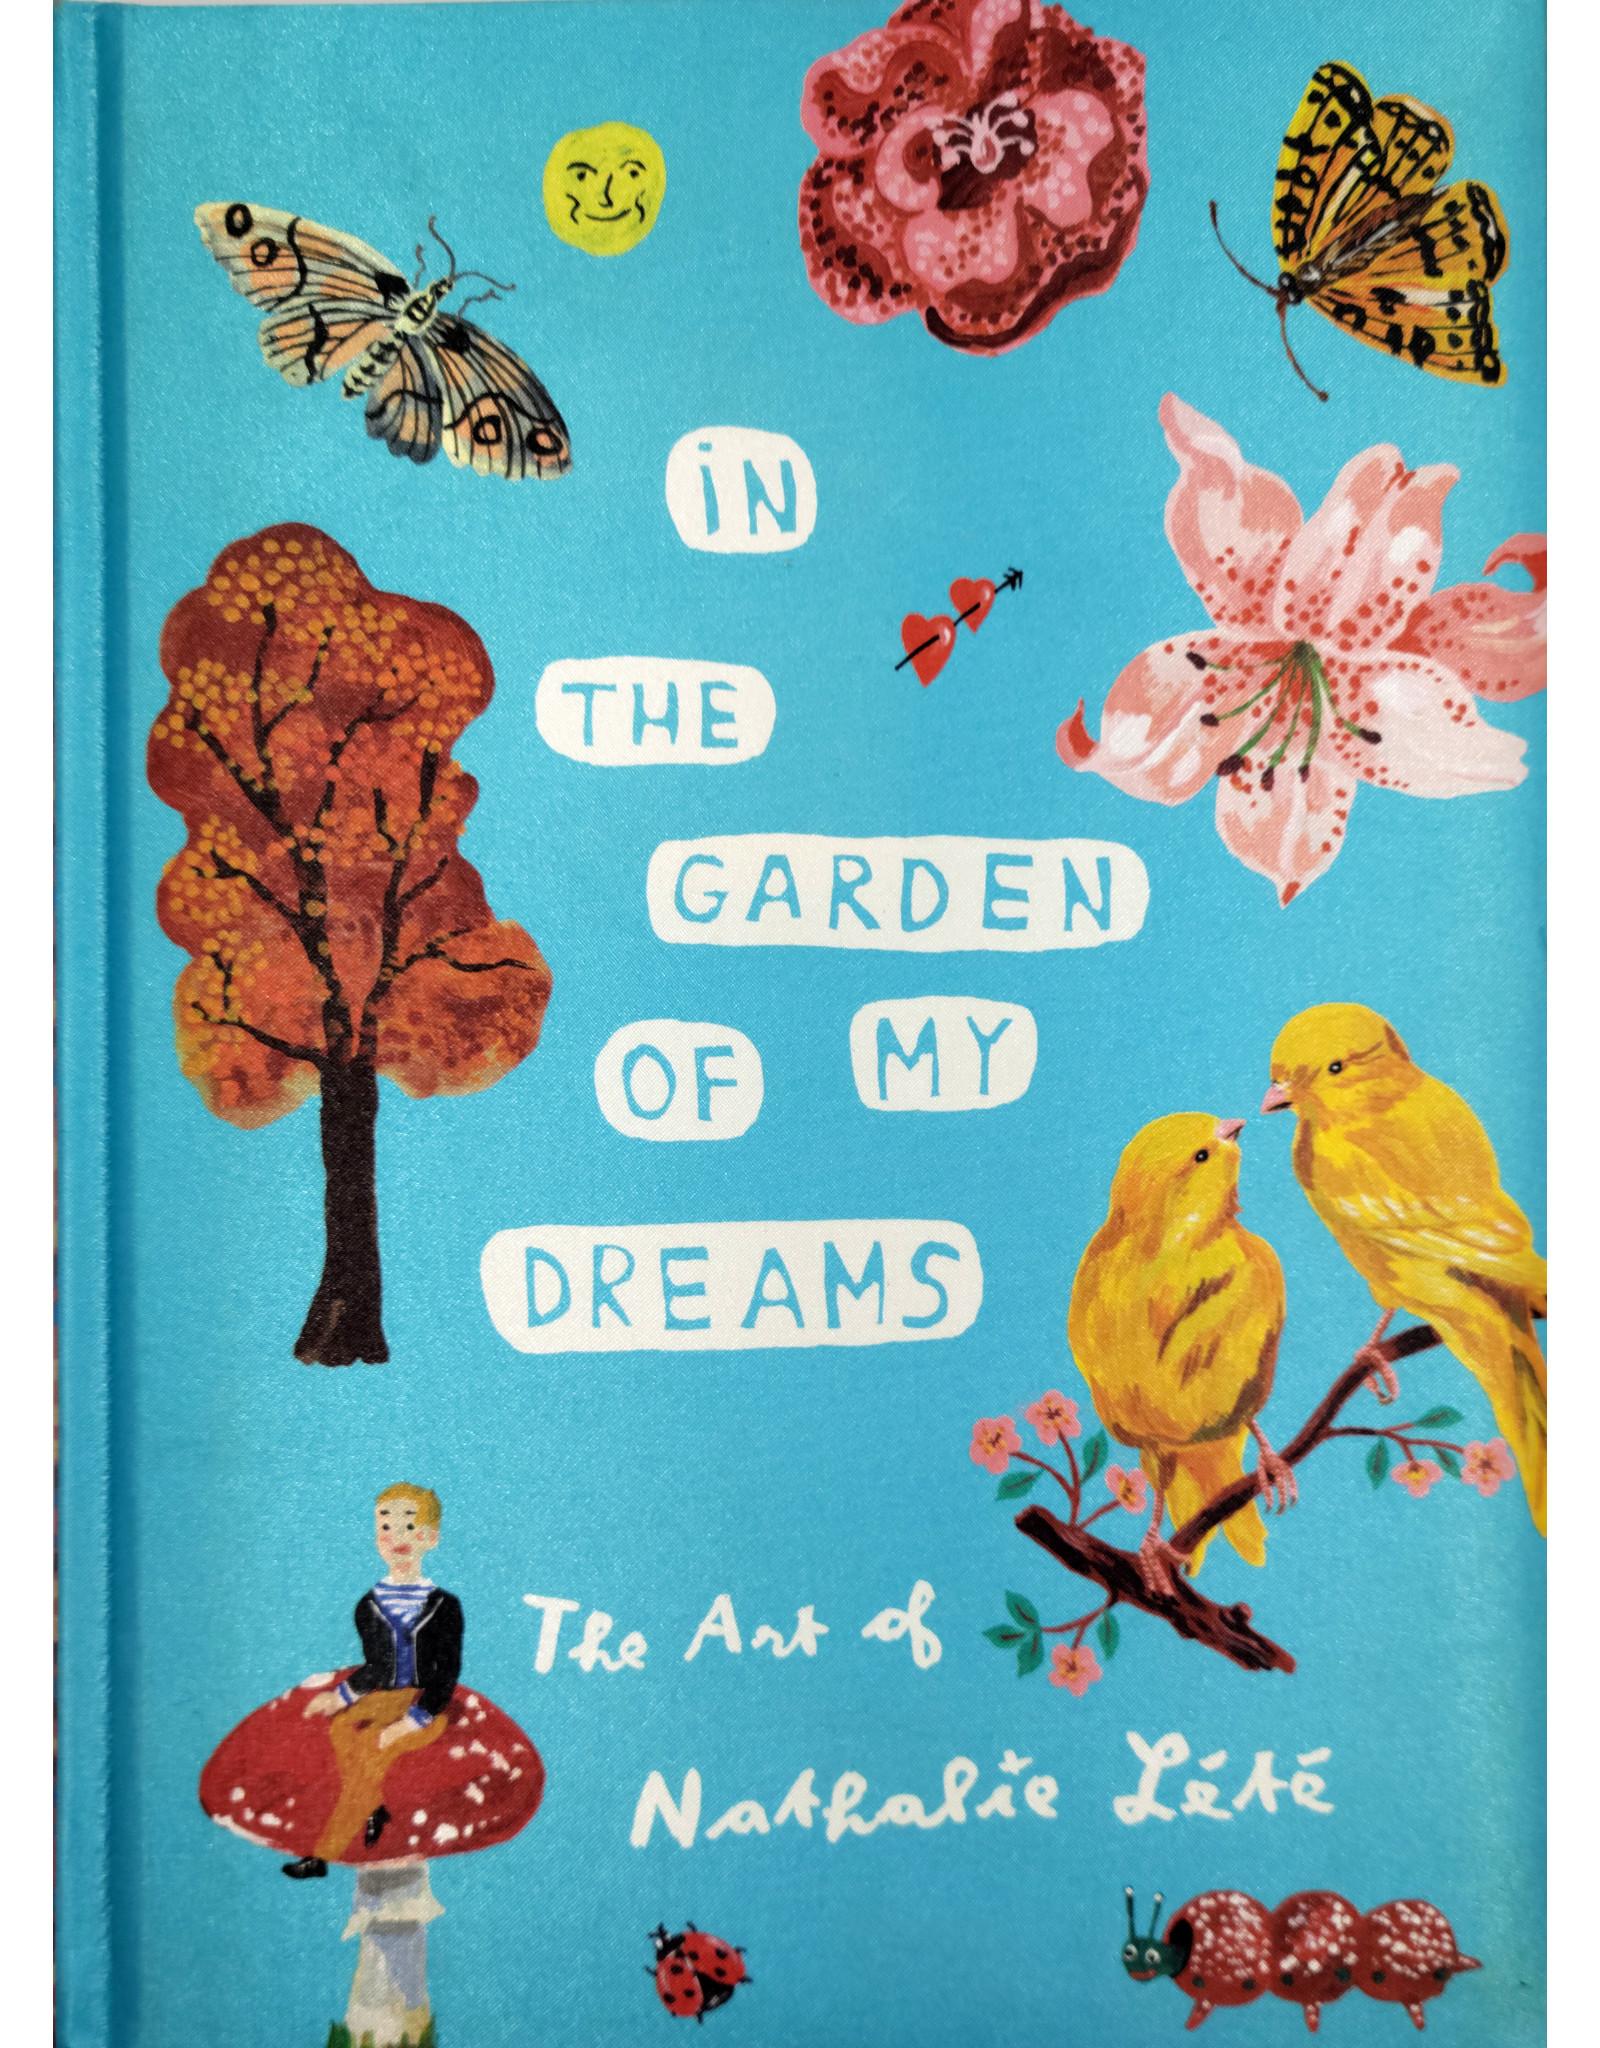 In the Garden of my Dreams